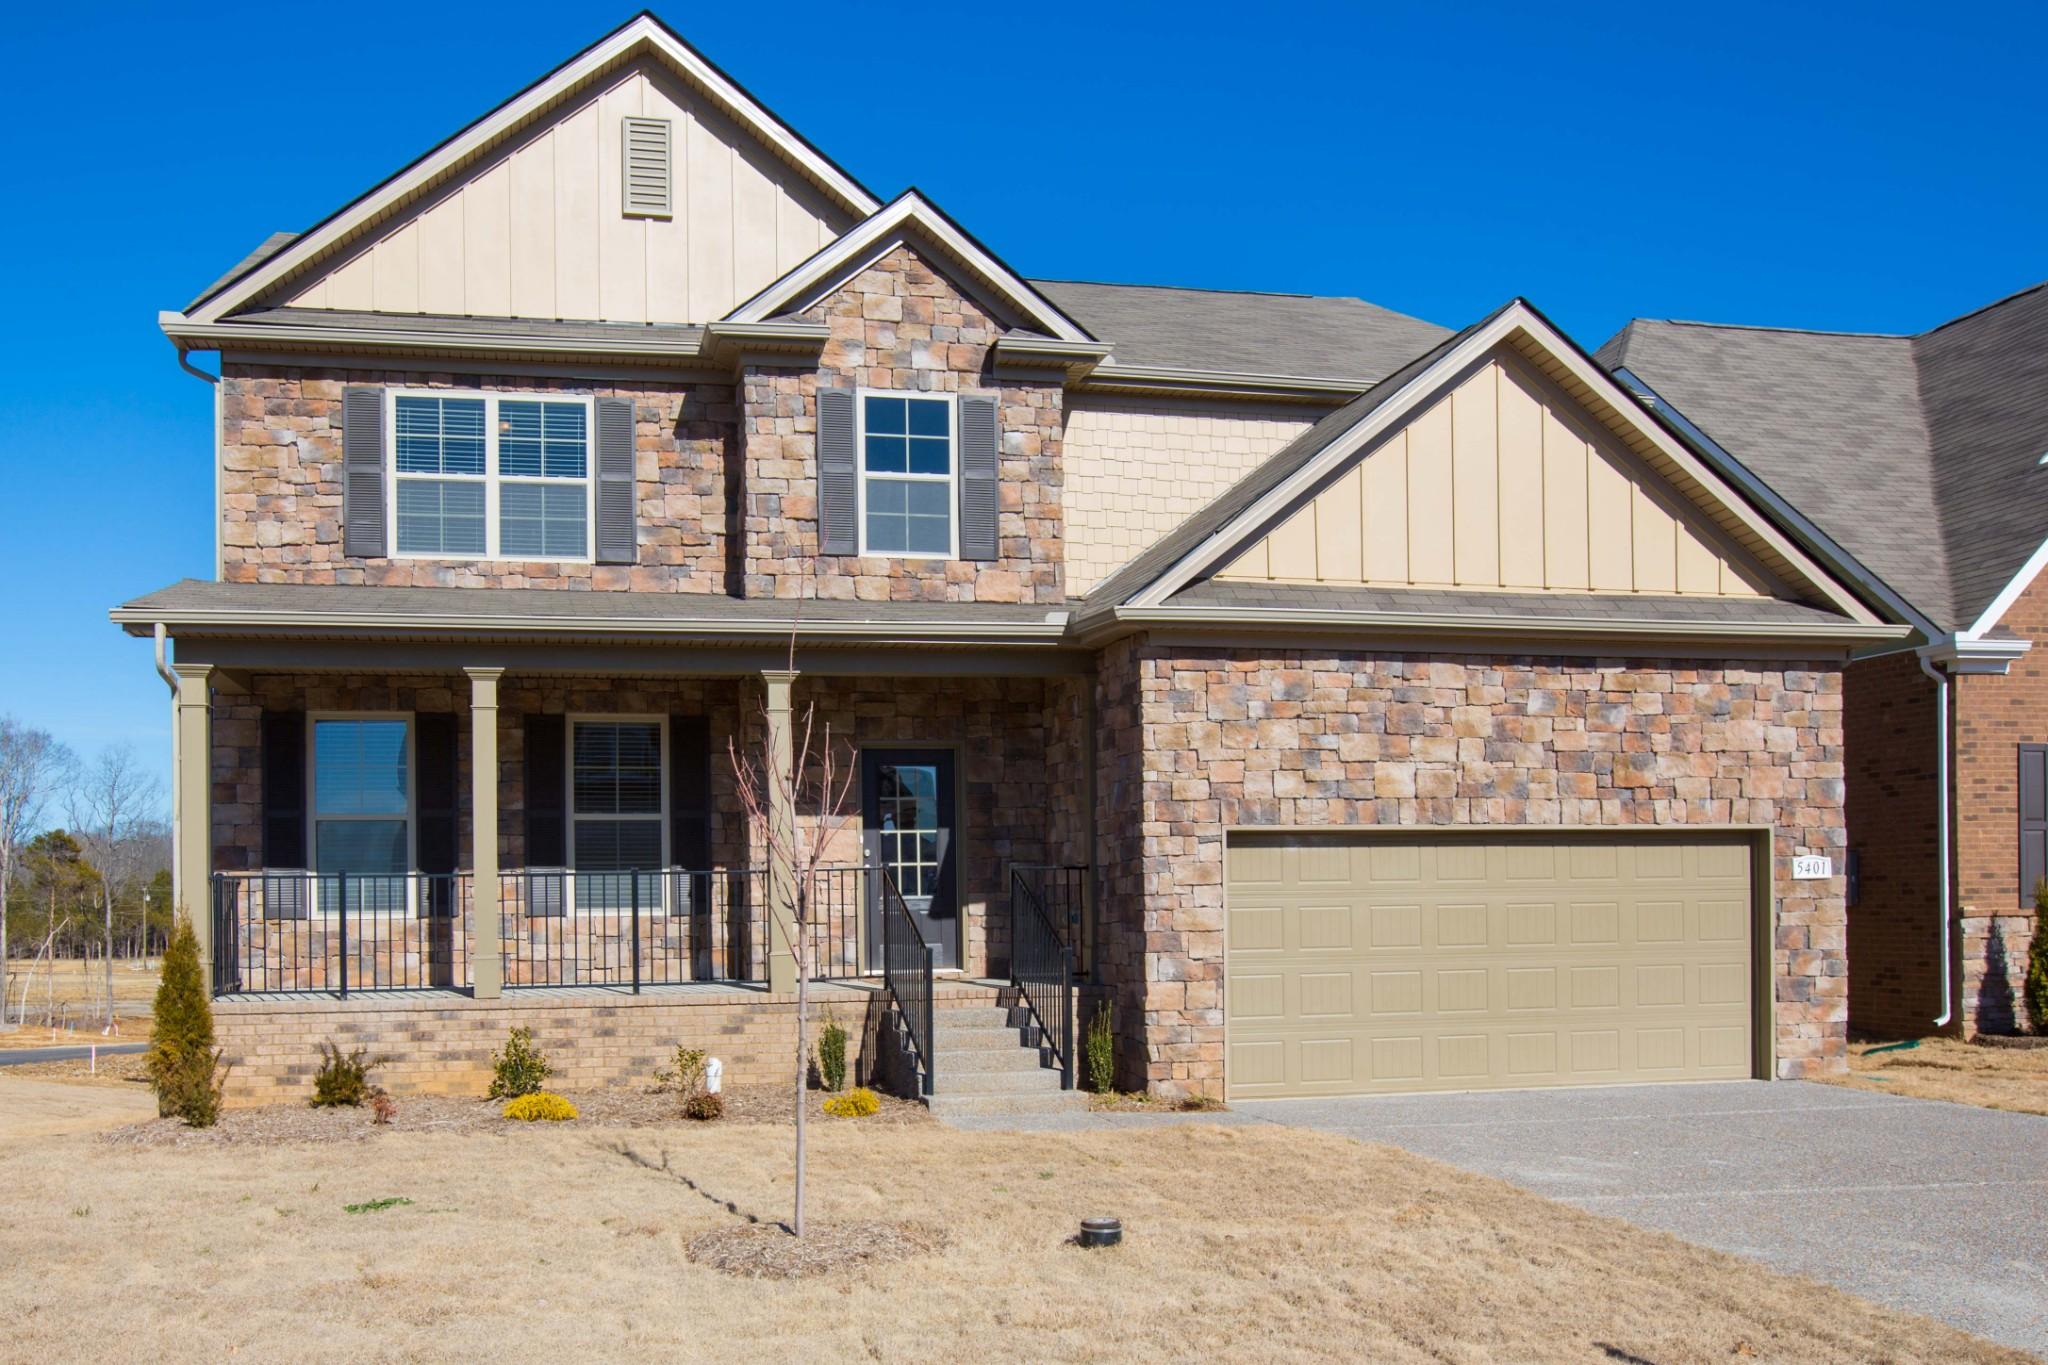 1006 Alta Vista Lane, #41 Property Photo - Smyrna, TN real estate listing